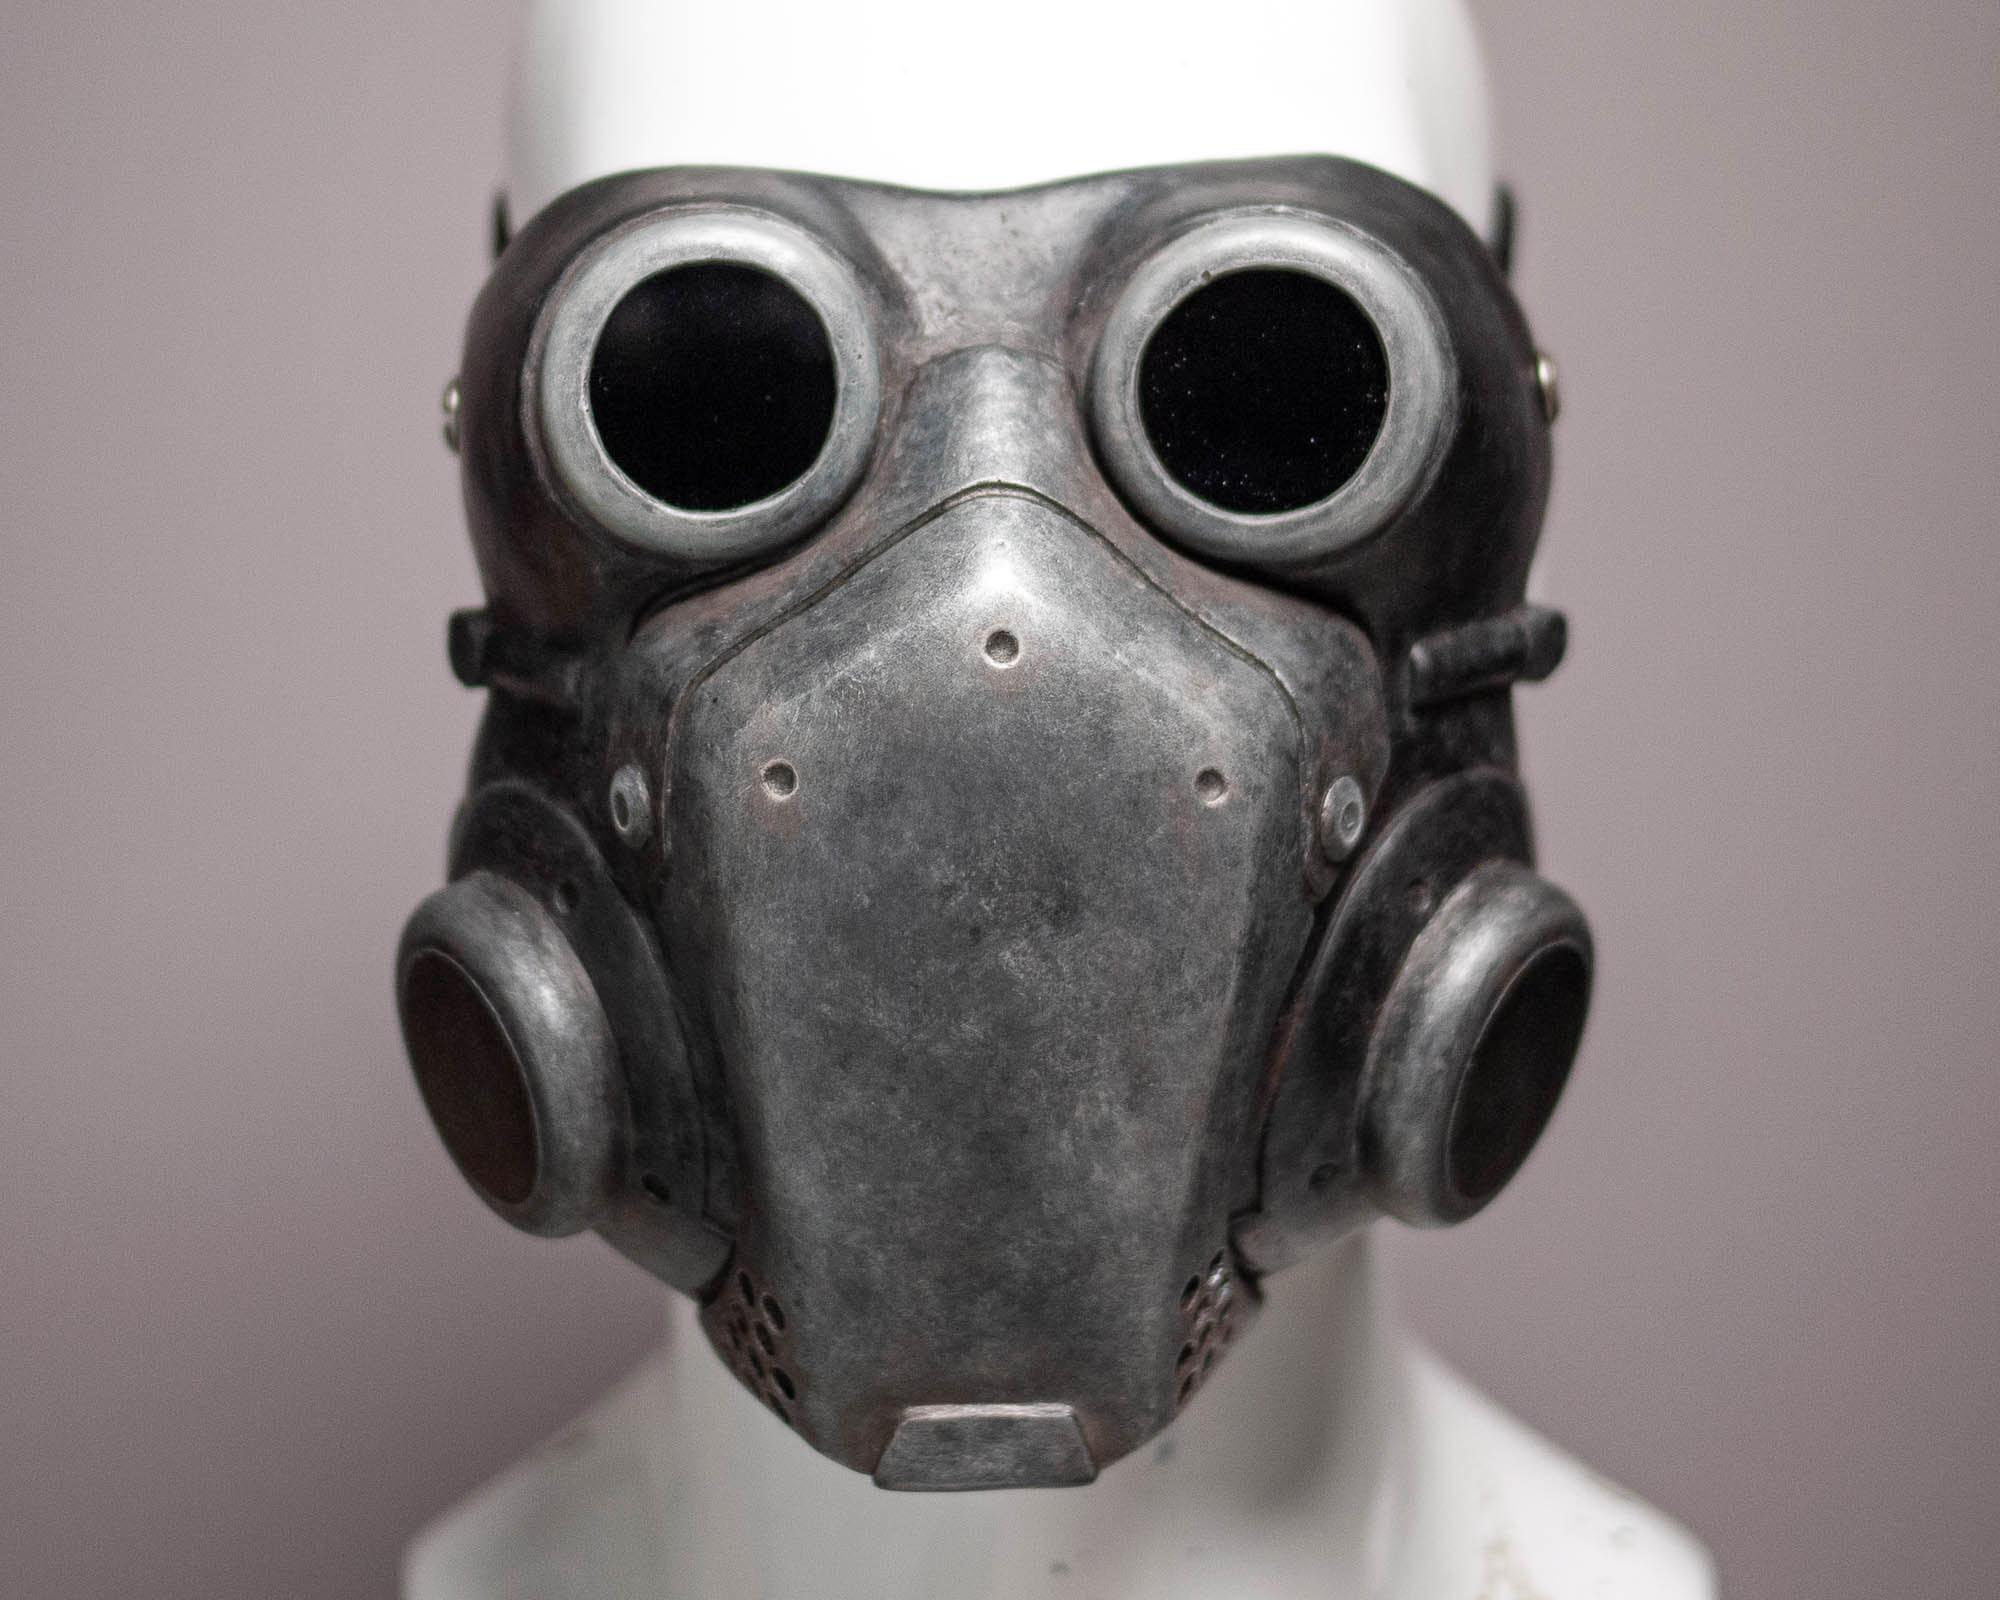 modulus-props-cyberpunk-mask-1.jpg